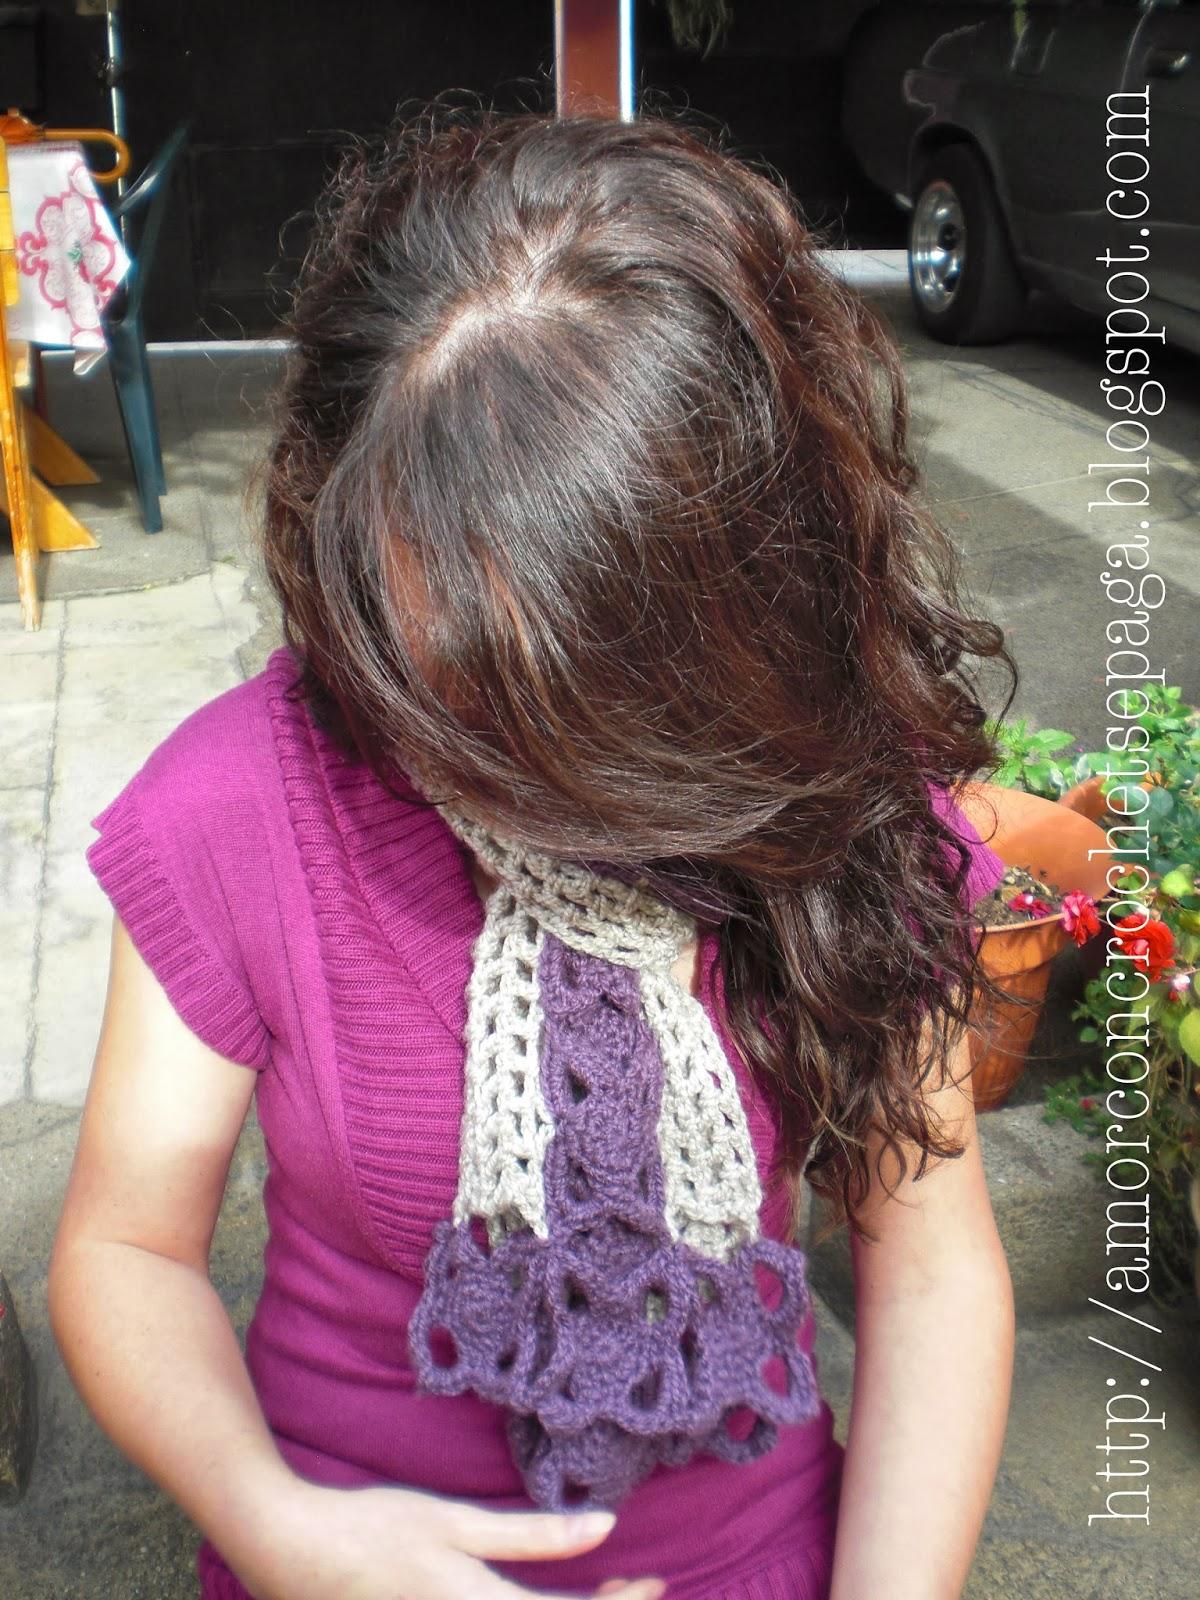 quezaltenango single women Elis 22 yo guatemalan woman elis seeking man 23-36 for marriage or long time relationship view all guatemalan brides free profiles of guatemalan brides, girls, single guatemalan women seeking men online for love, guatemalan dating.